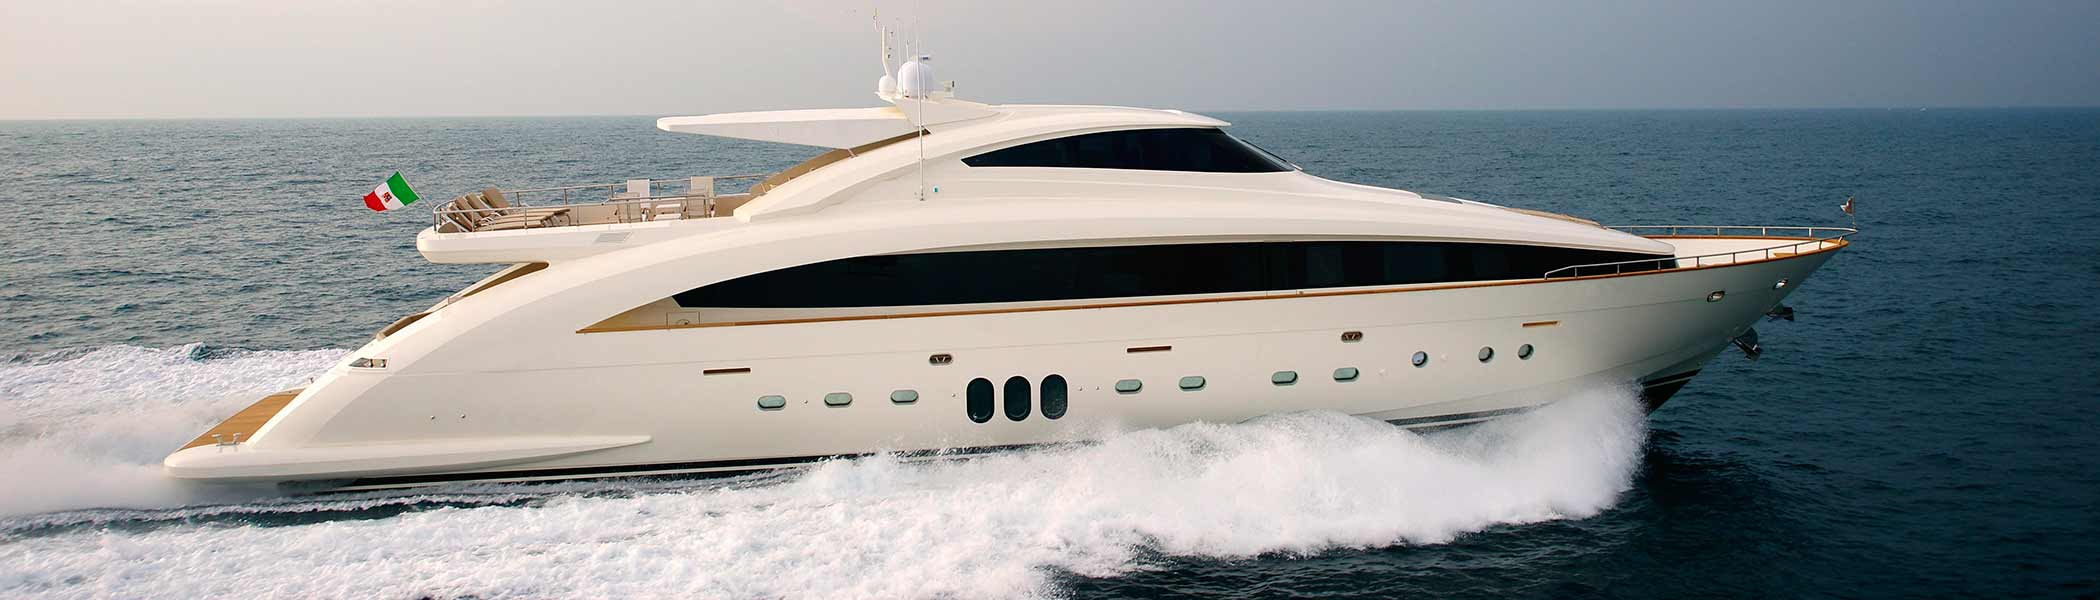 Amer Yachts - Amer 116 a116-2